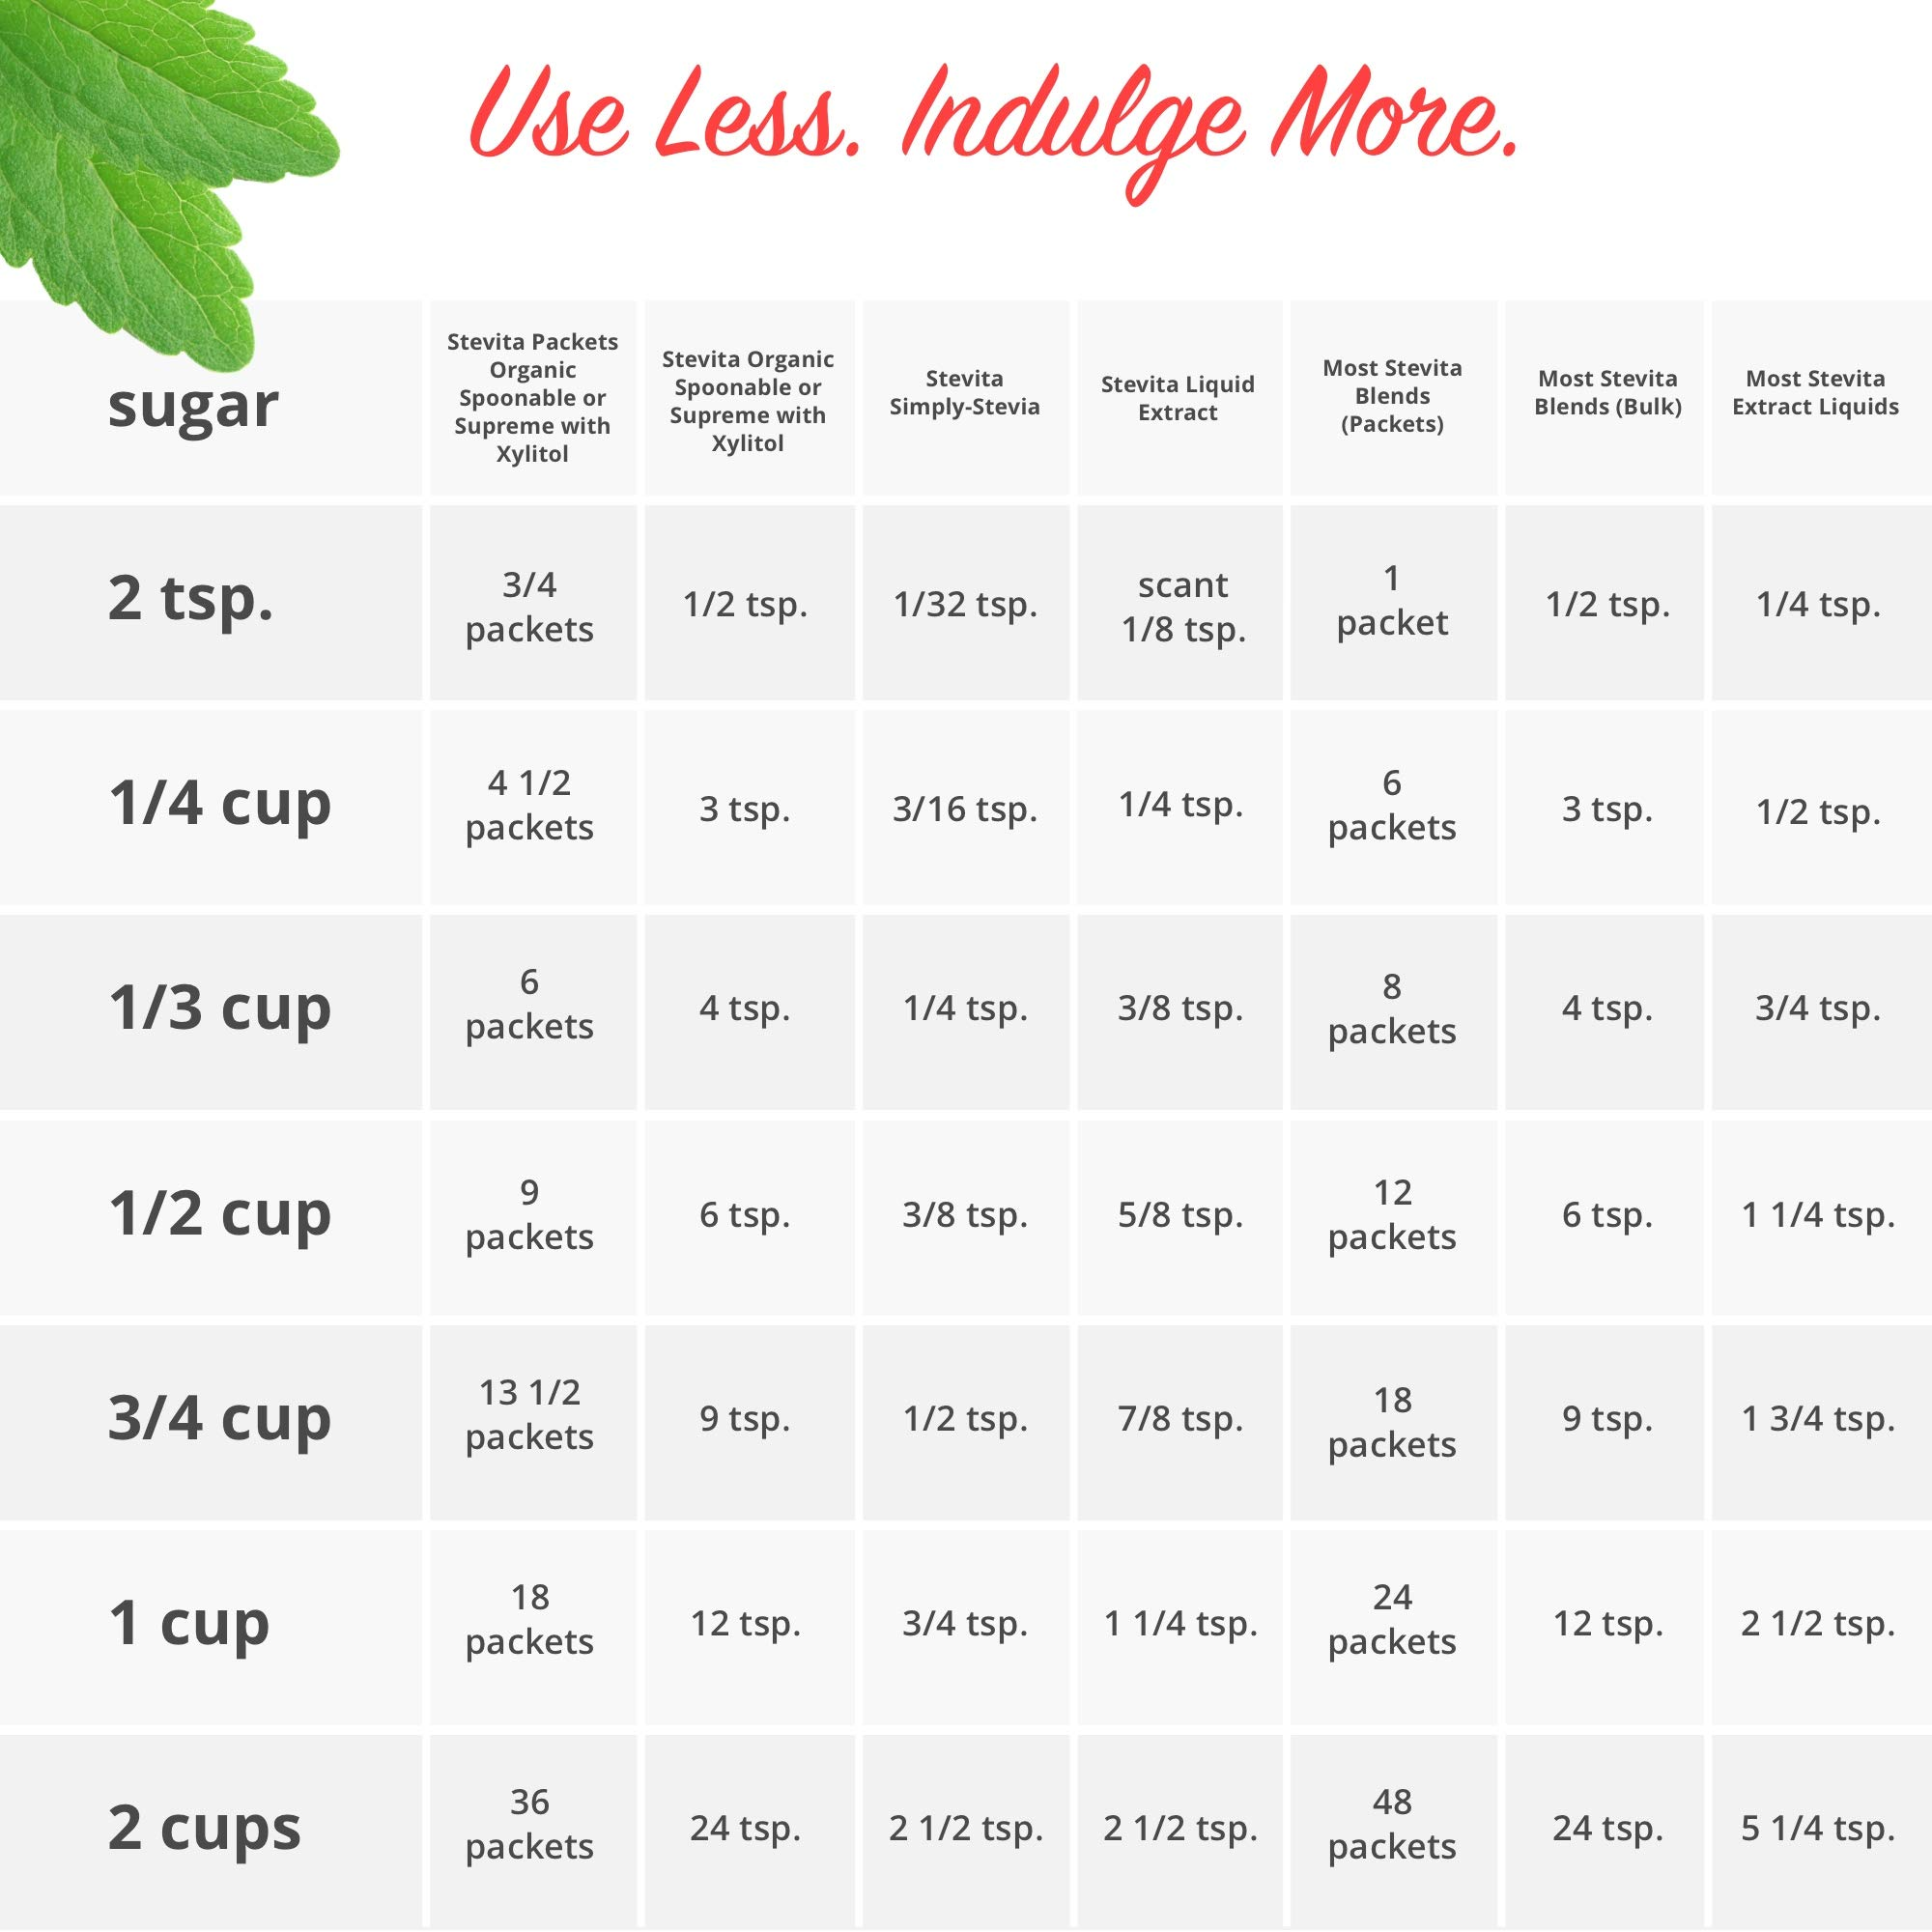 Stevita Stevia Organic Spoonable Stevia Powder - 50 Packets - Stevia & Erythritol All Natural Sweetener, No Calories - USDA Organic, Non GMO, Vegan, Keto, Paleo, Gluten-Free - 50 Servings by STEVITA (Image #9)